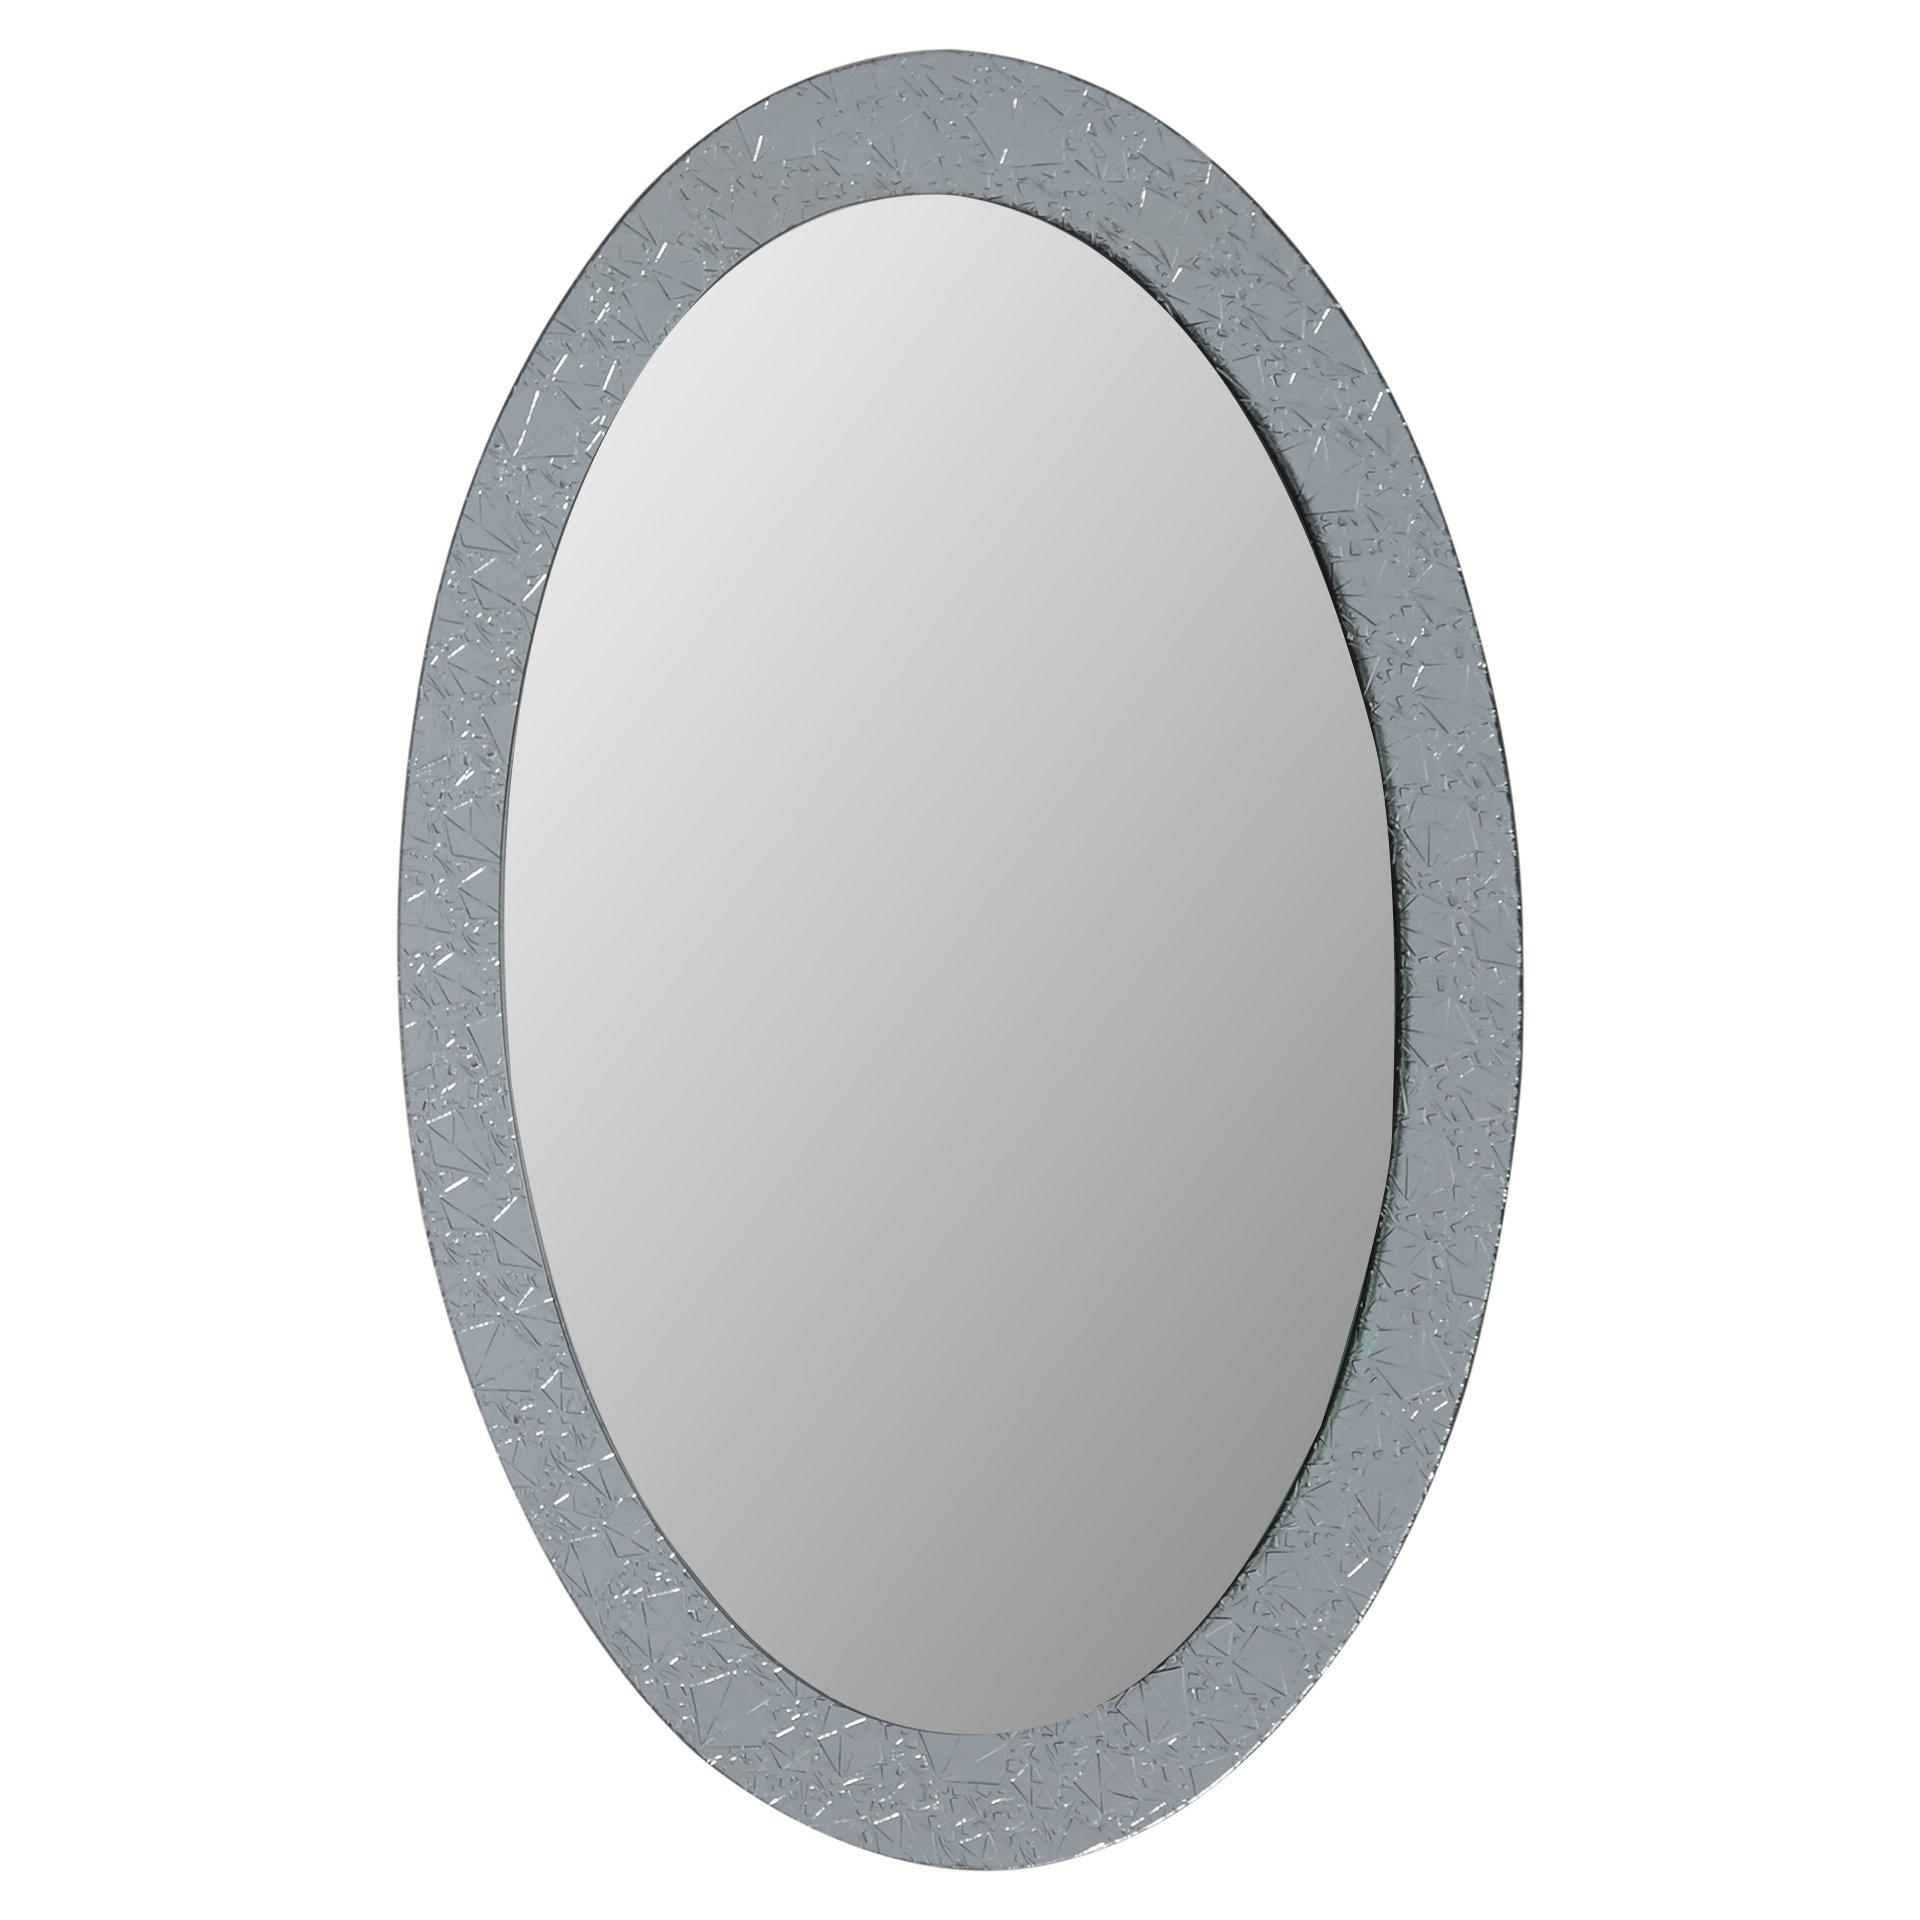 Current Willa Arlo Interiors Sajish Oval Crystal Wall Mirror Pertaining To Sajish Oval Crystal Wall Mirrors (View 2 of 20)